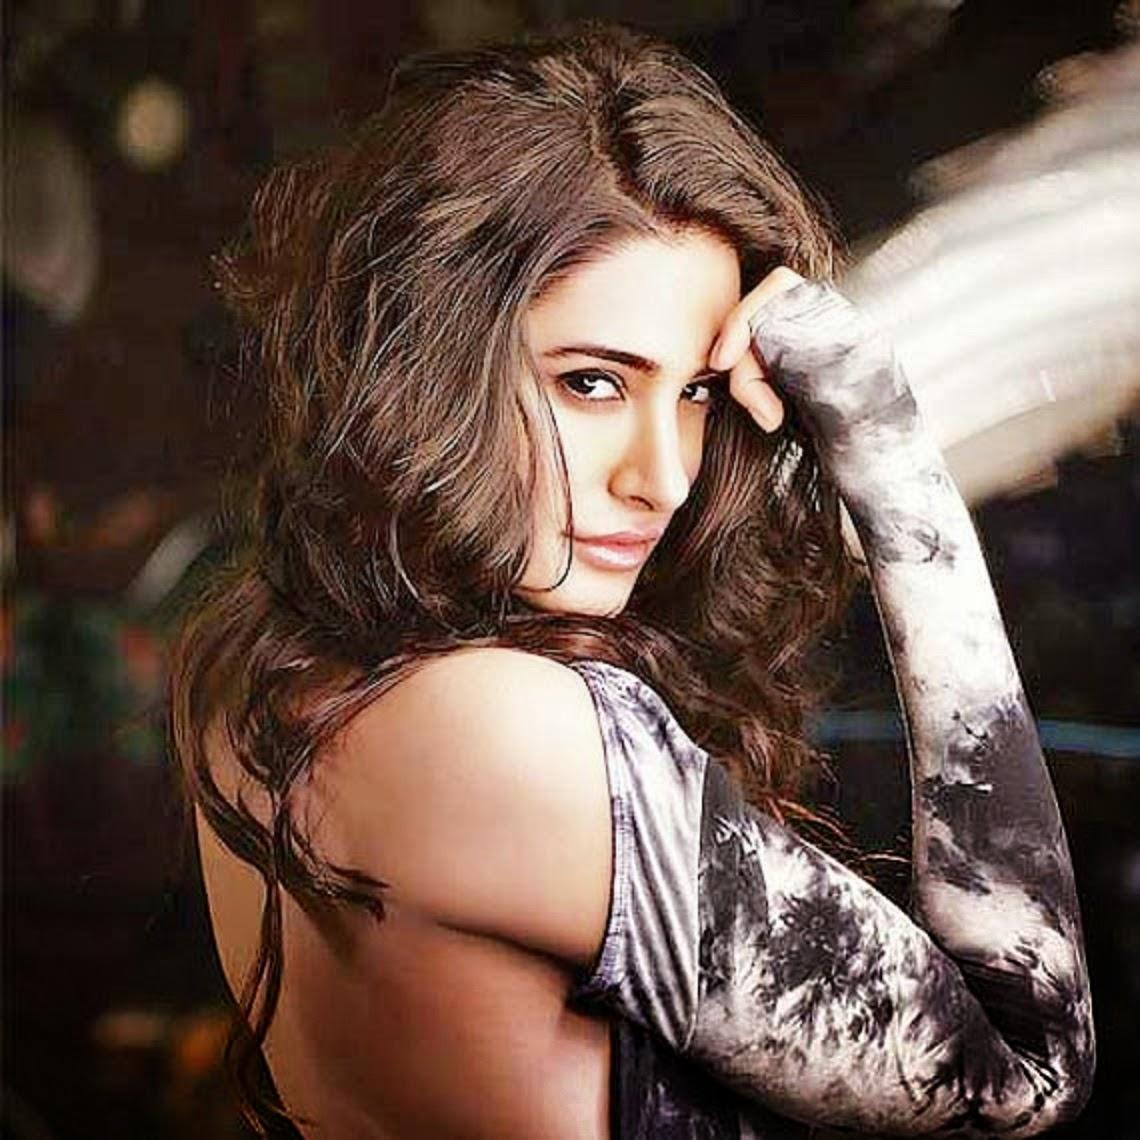 Bmwpanies Latest Models: Nargis Fakhri Exclusive Hd Wallpapers, Photoshoot, Hd Pics